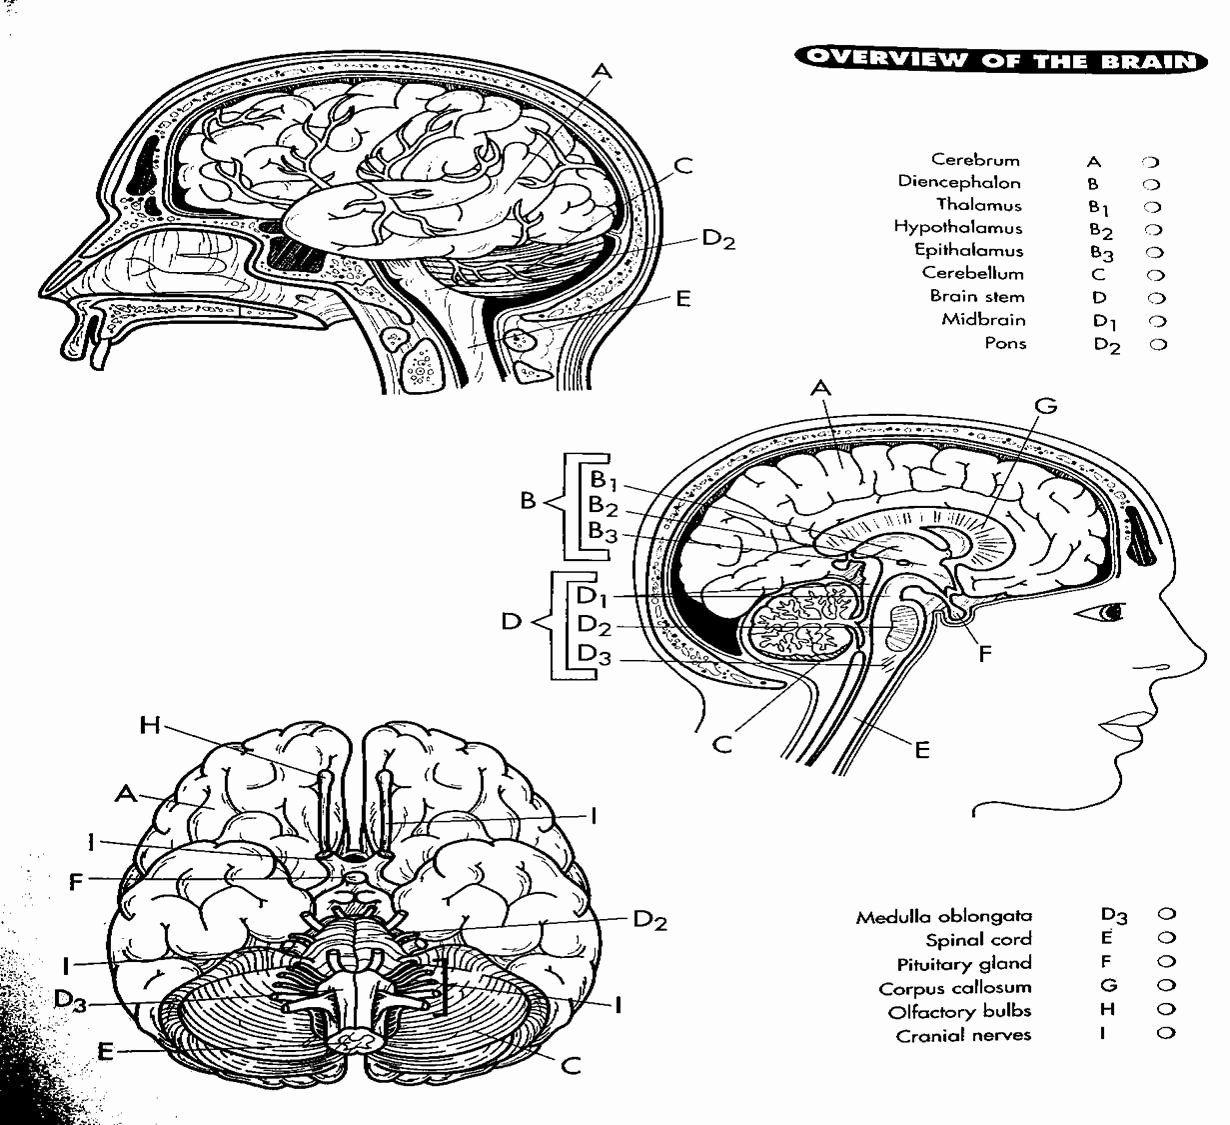 Human Brain Coloring Book Fresh Brain Diagram Coloring Page Sketch Coloring Page Anatomy Coloring Book Color Worksheets Integumentary System